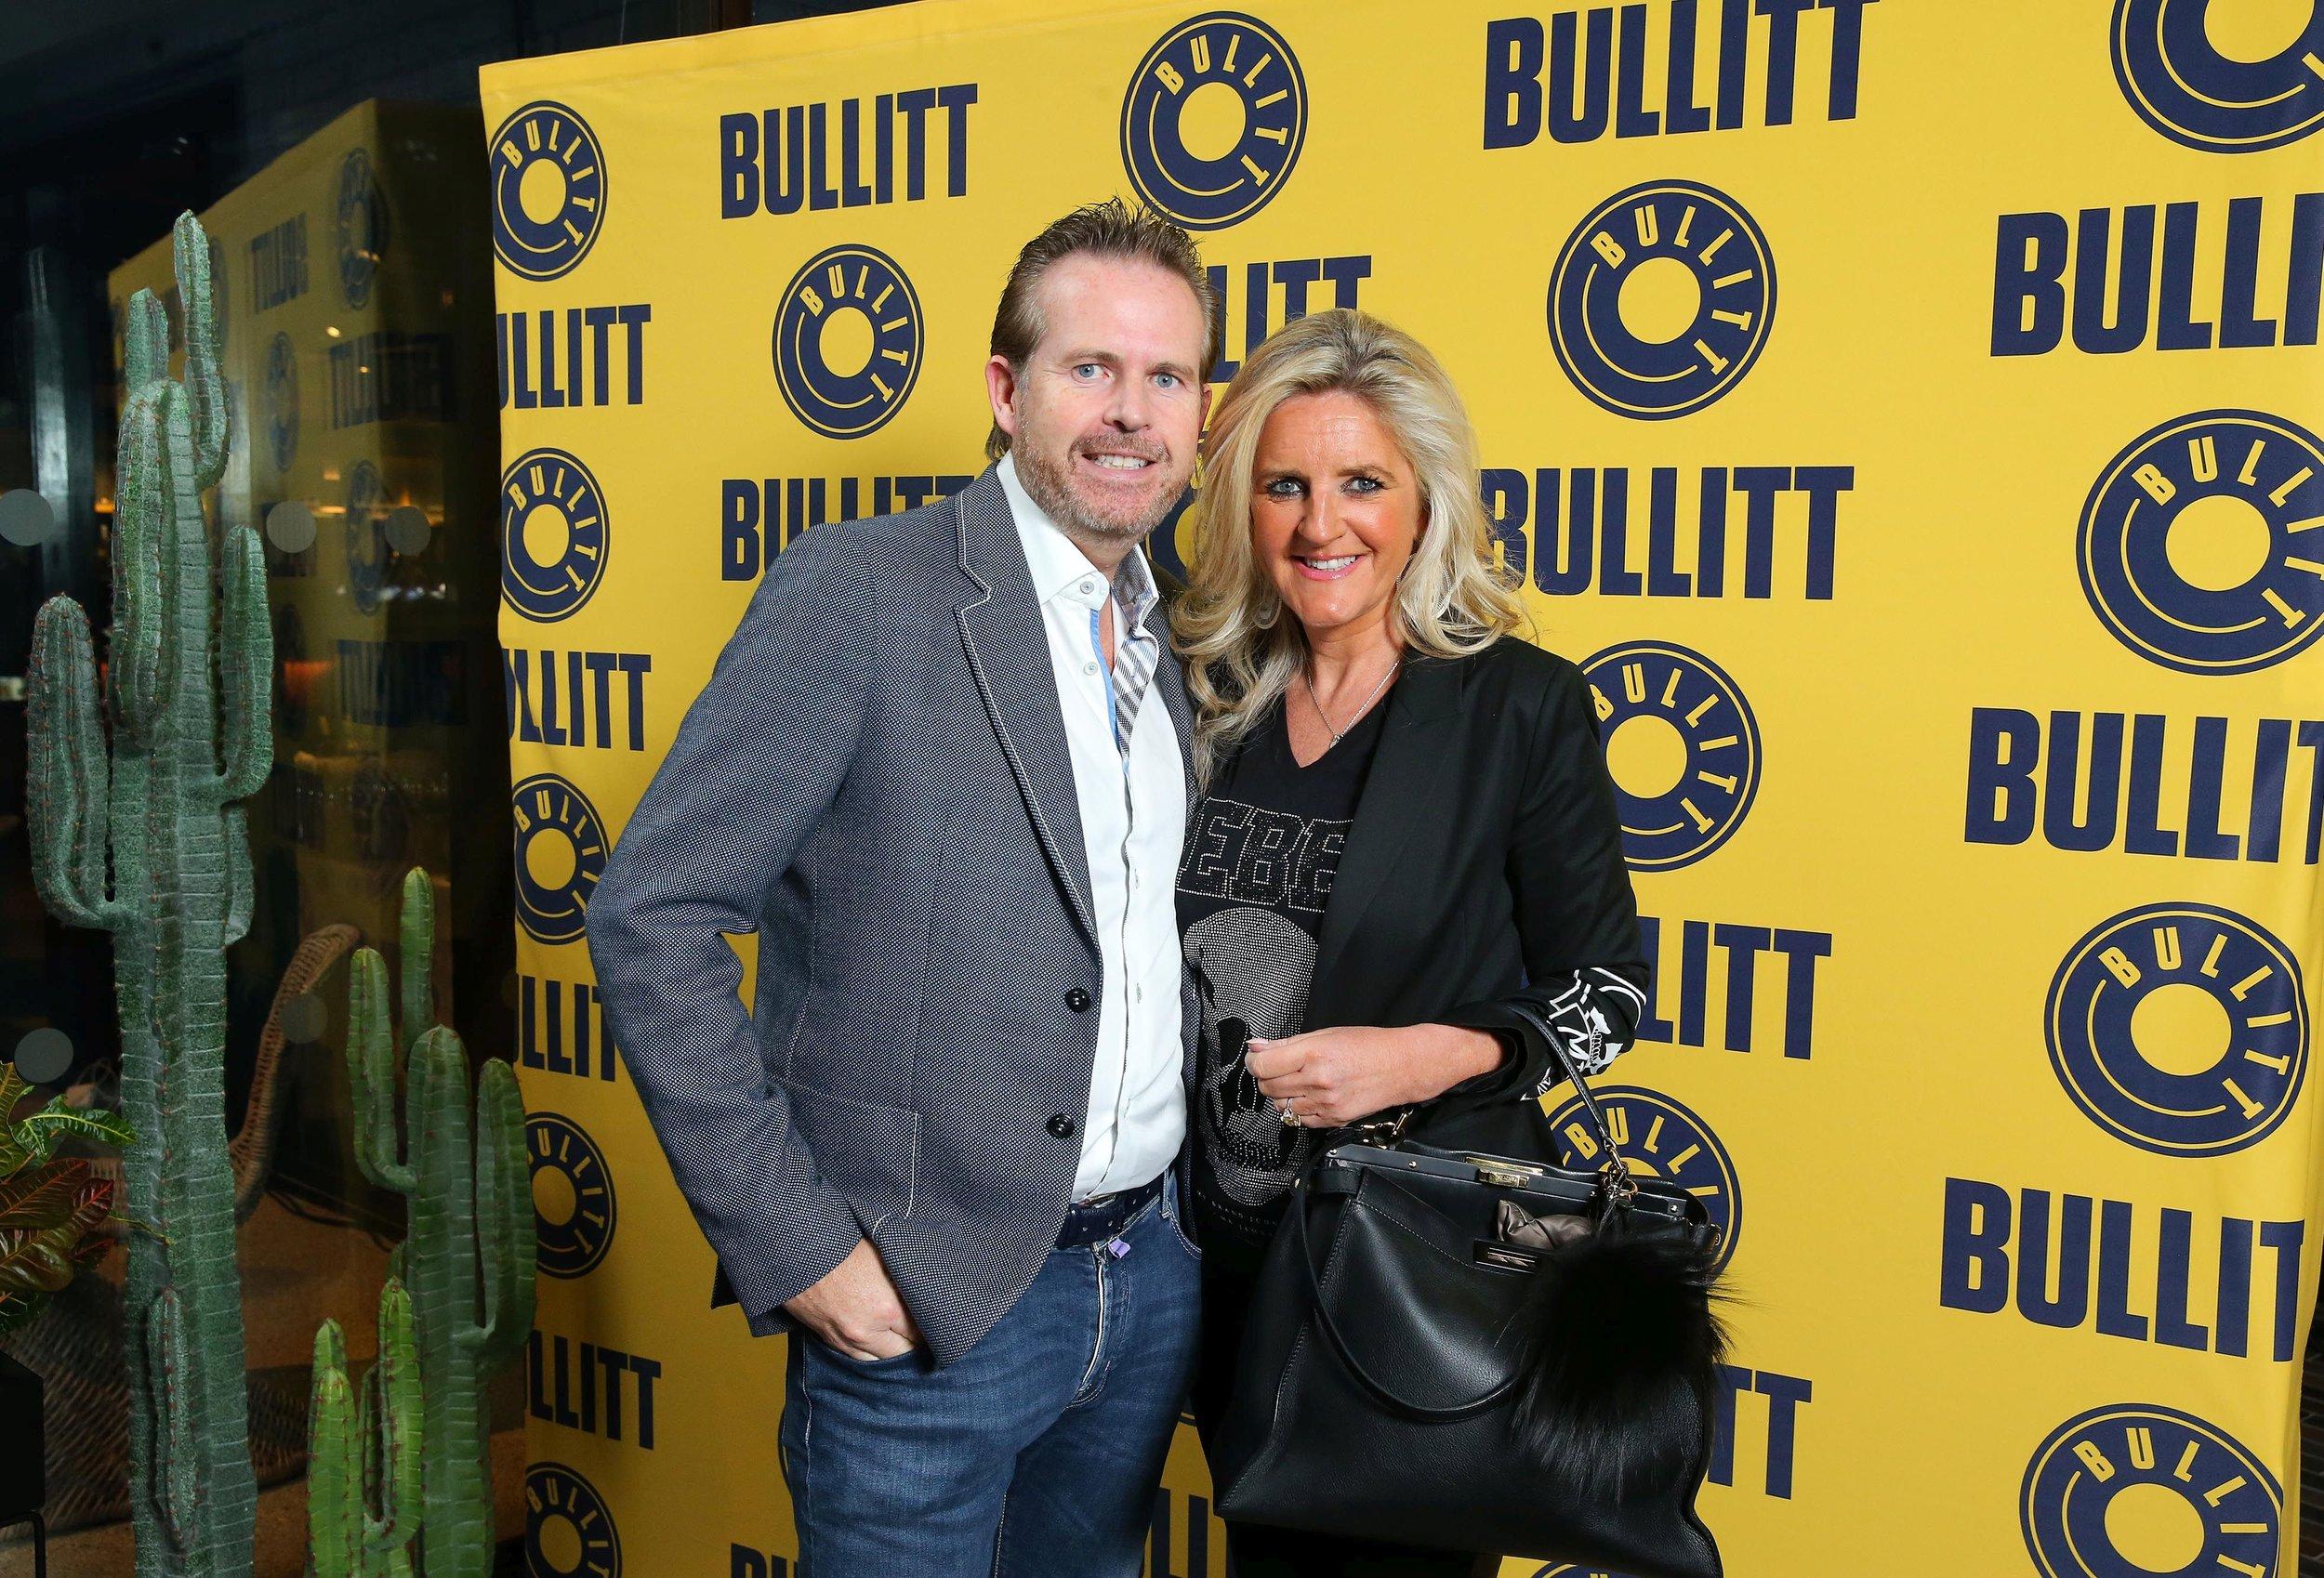 Bullitt Launch Socials 16.JPG